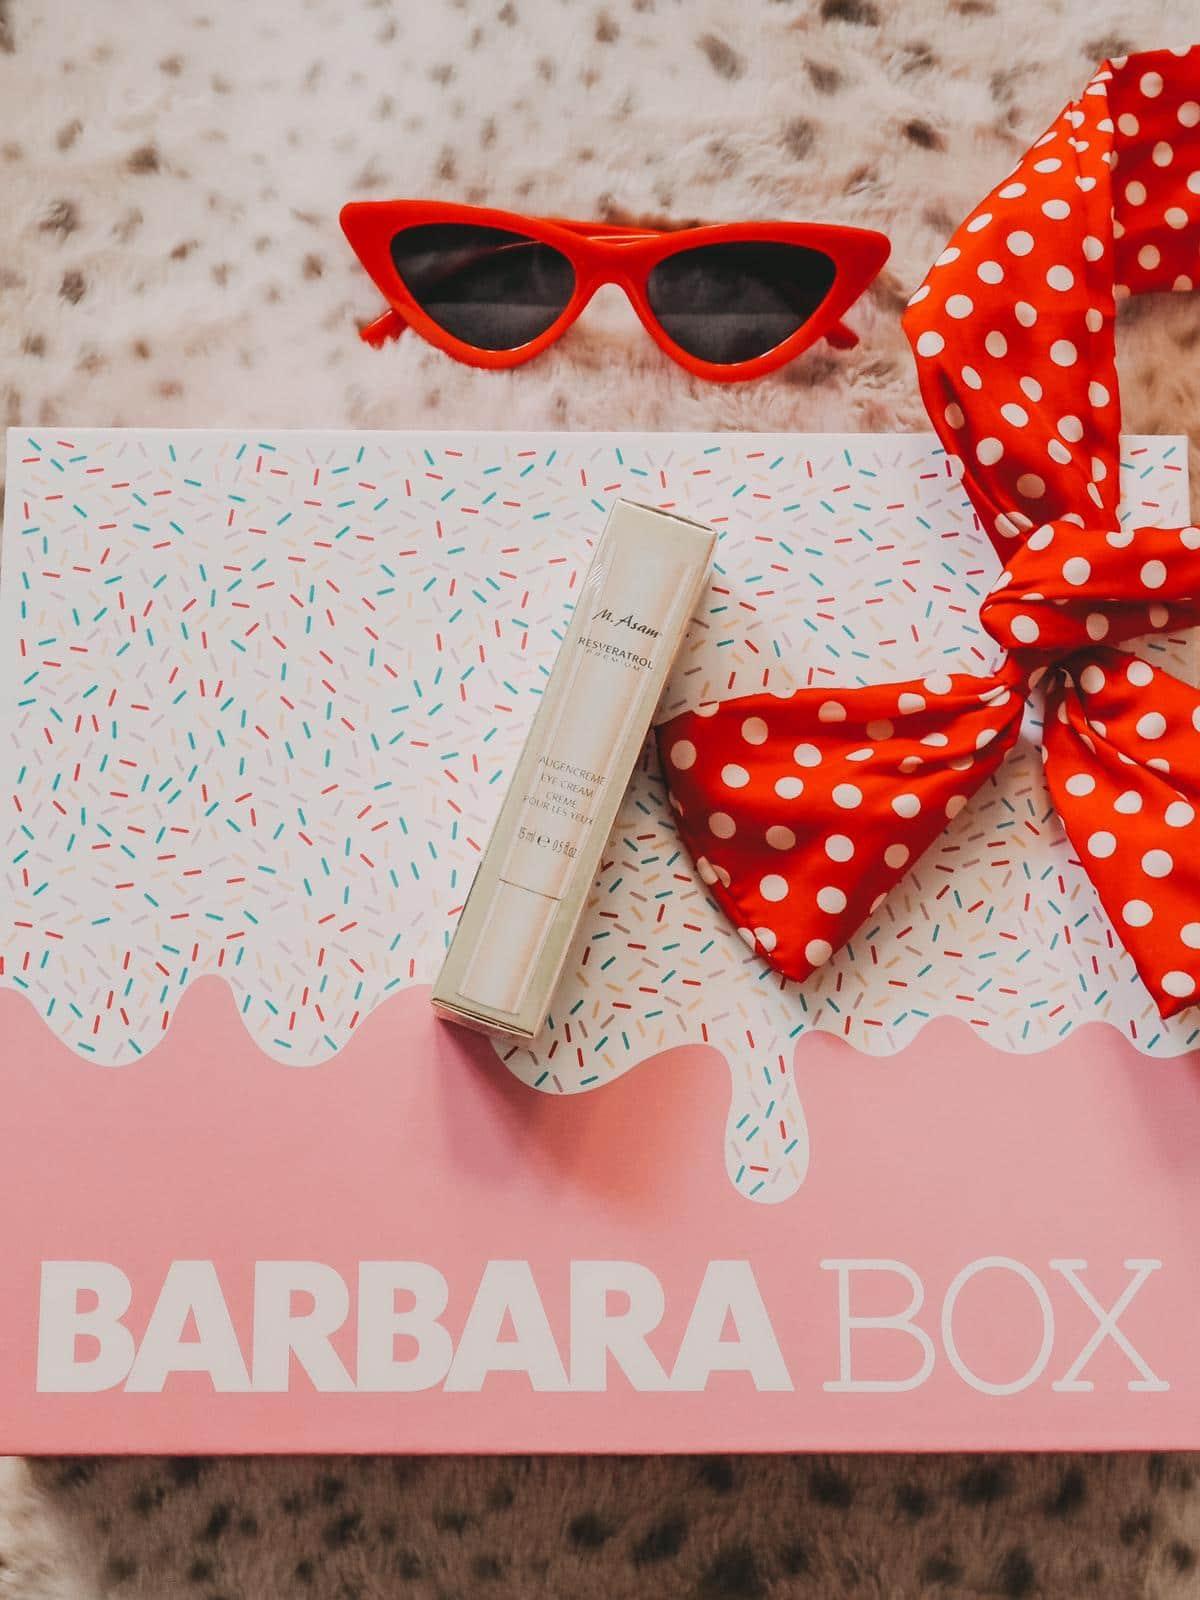 Resveratol Augencreme in der Barbara Box Sahneschnitte